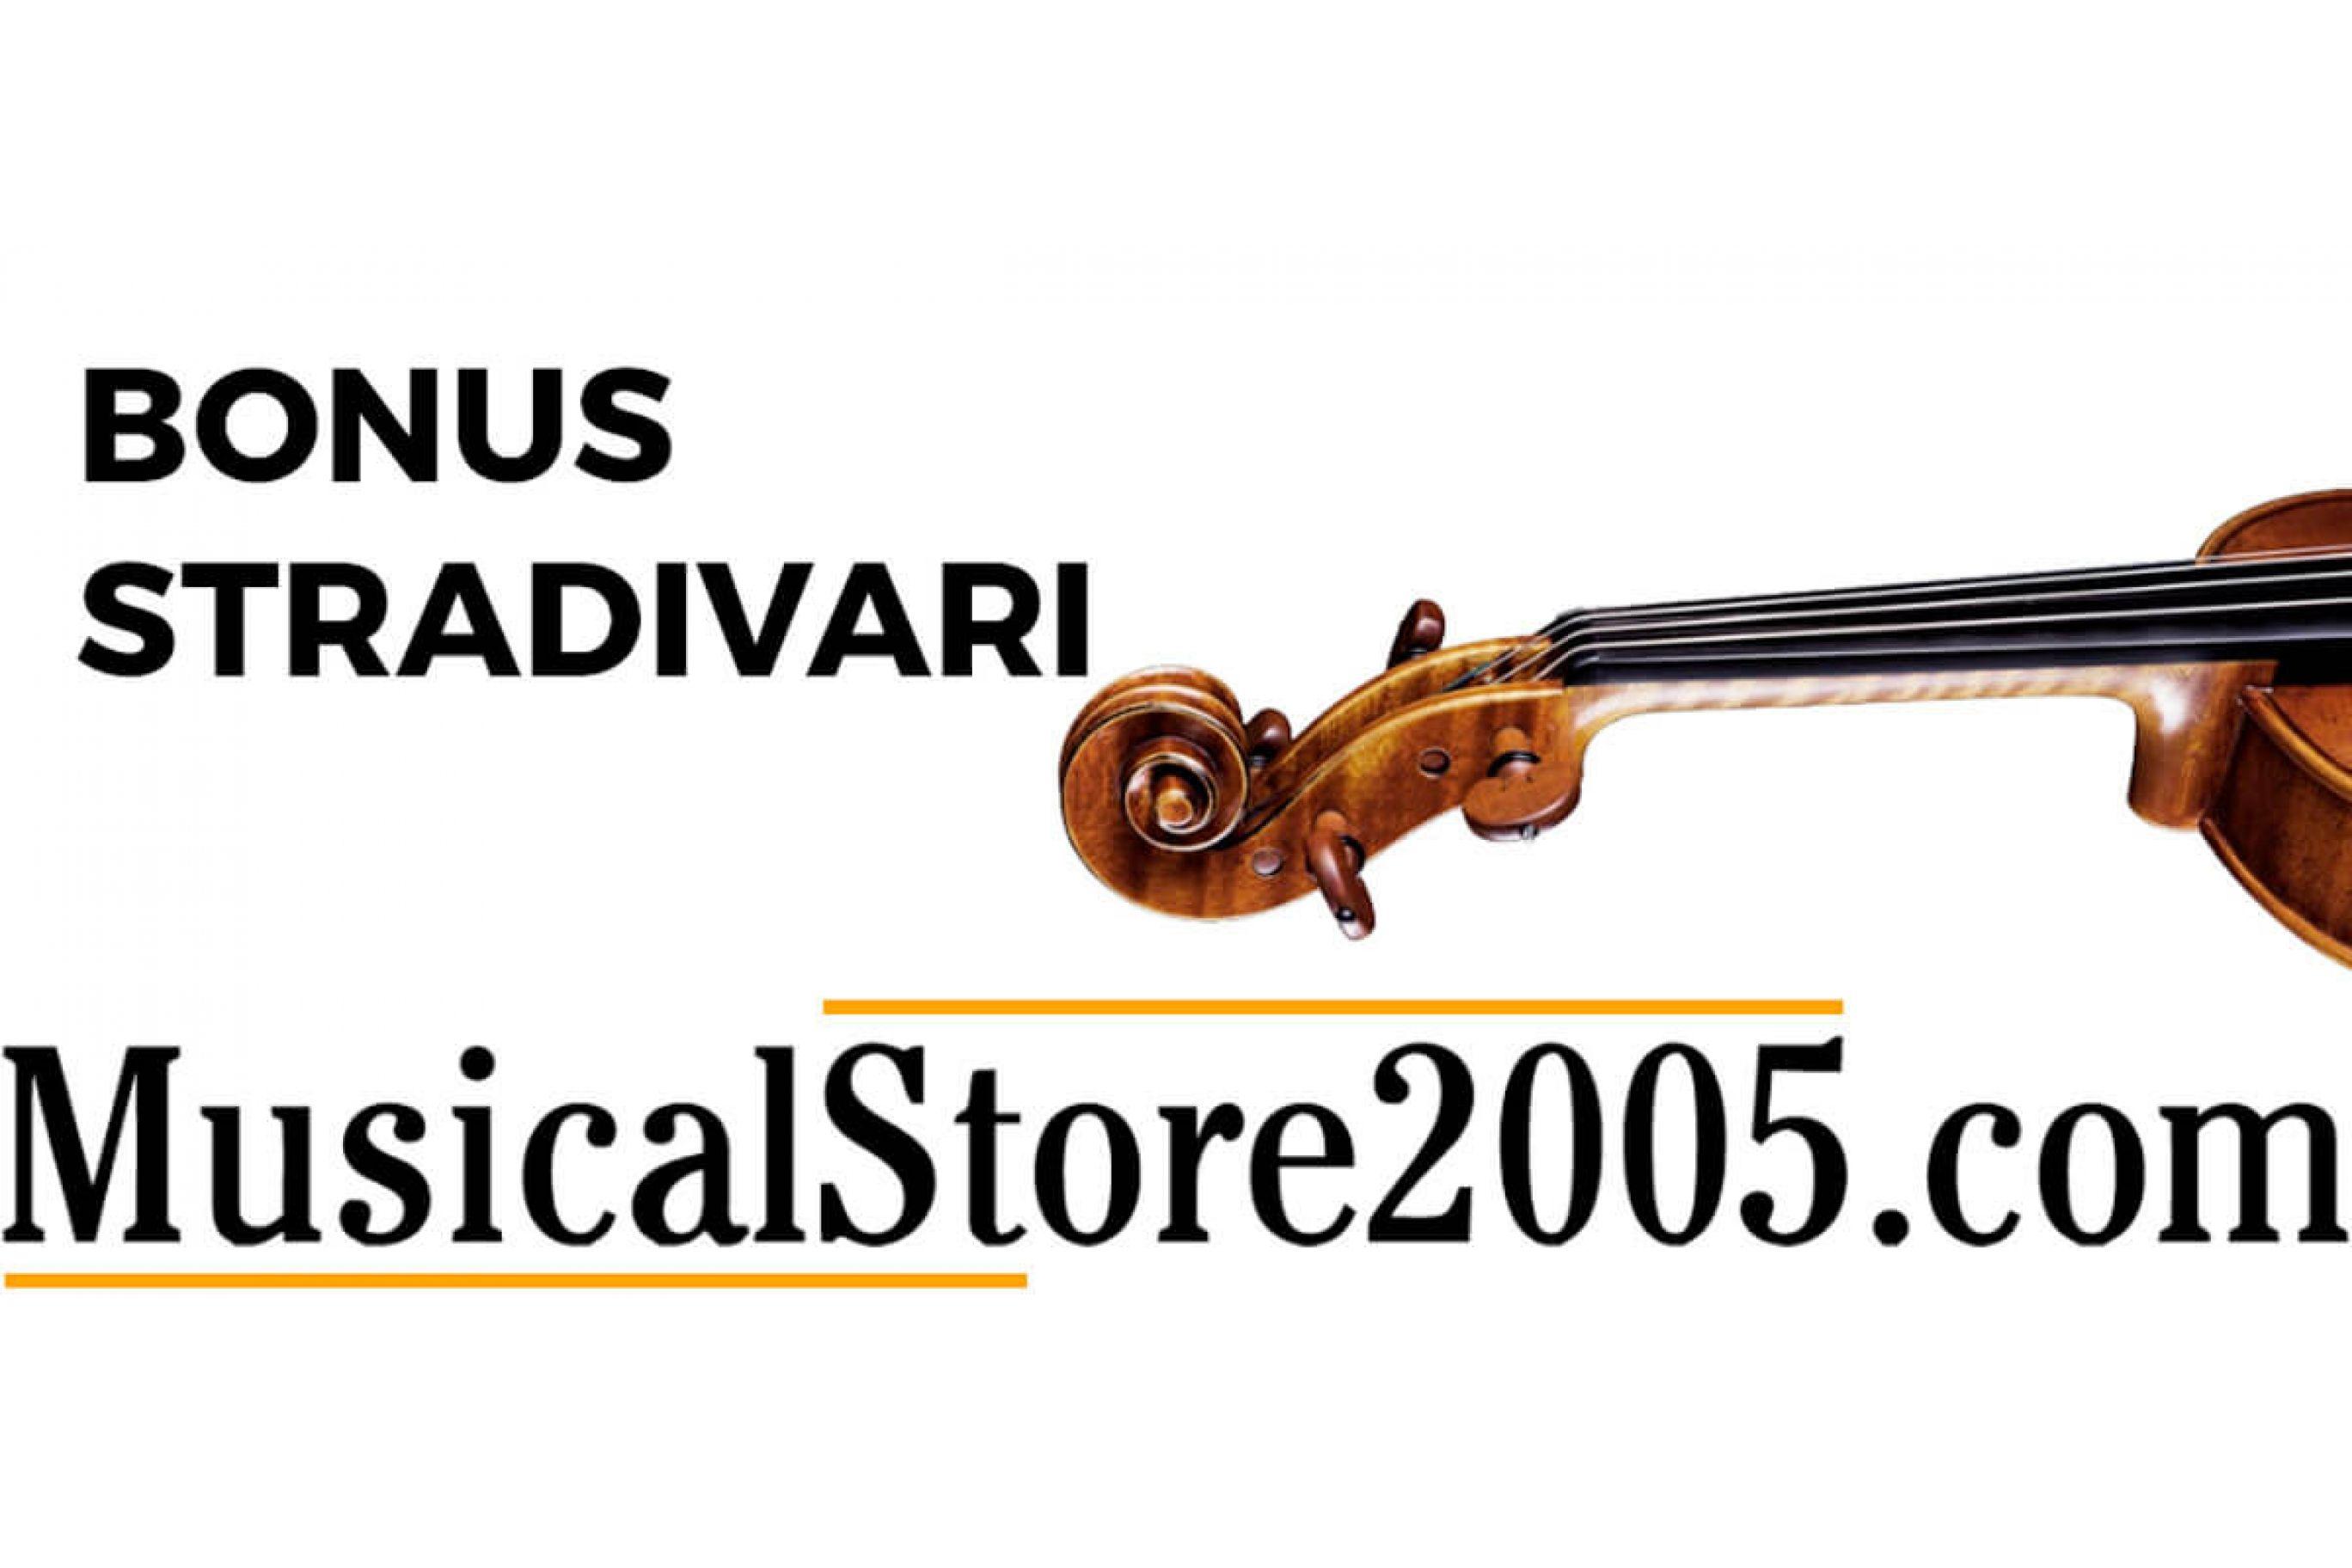 Bonus Stradivari 2018 - Strumenti Musicali